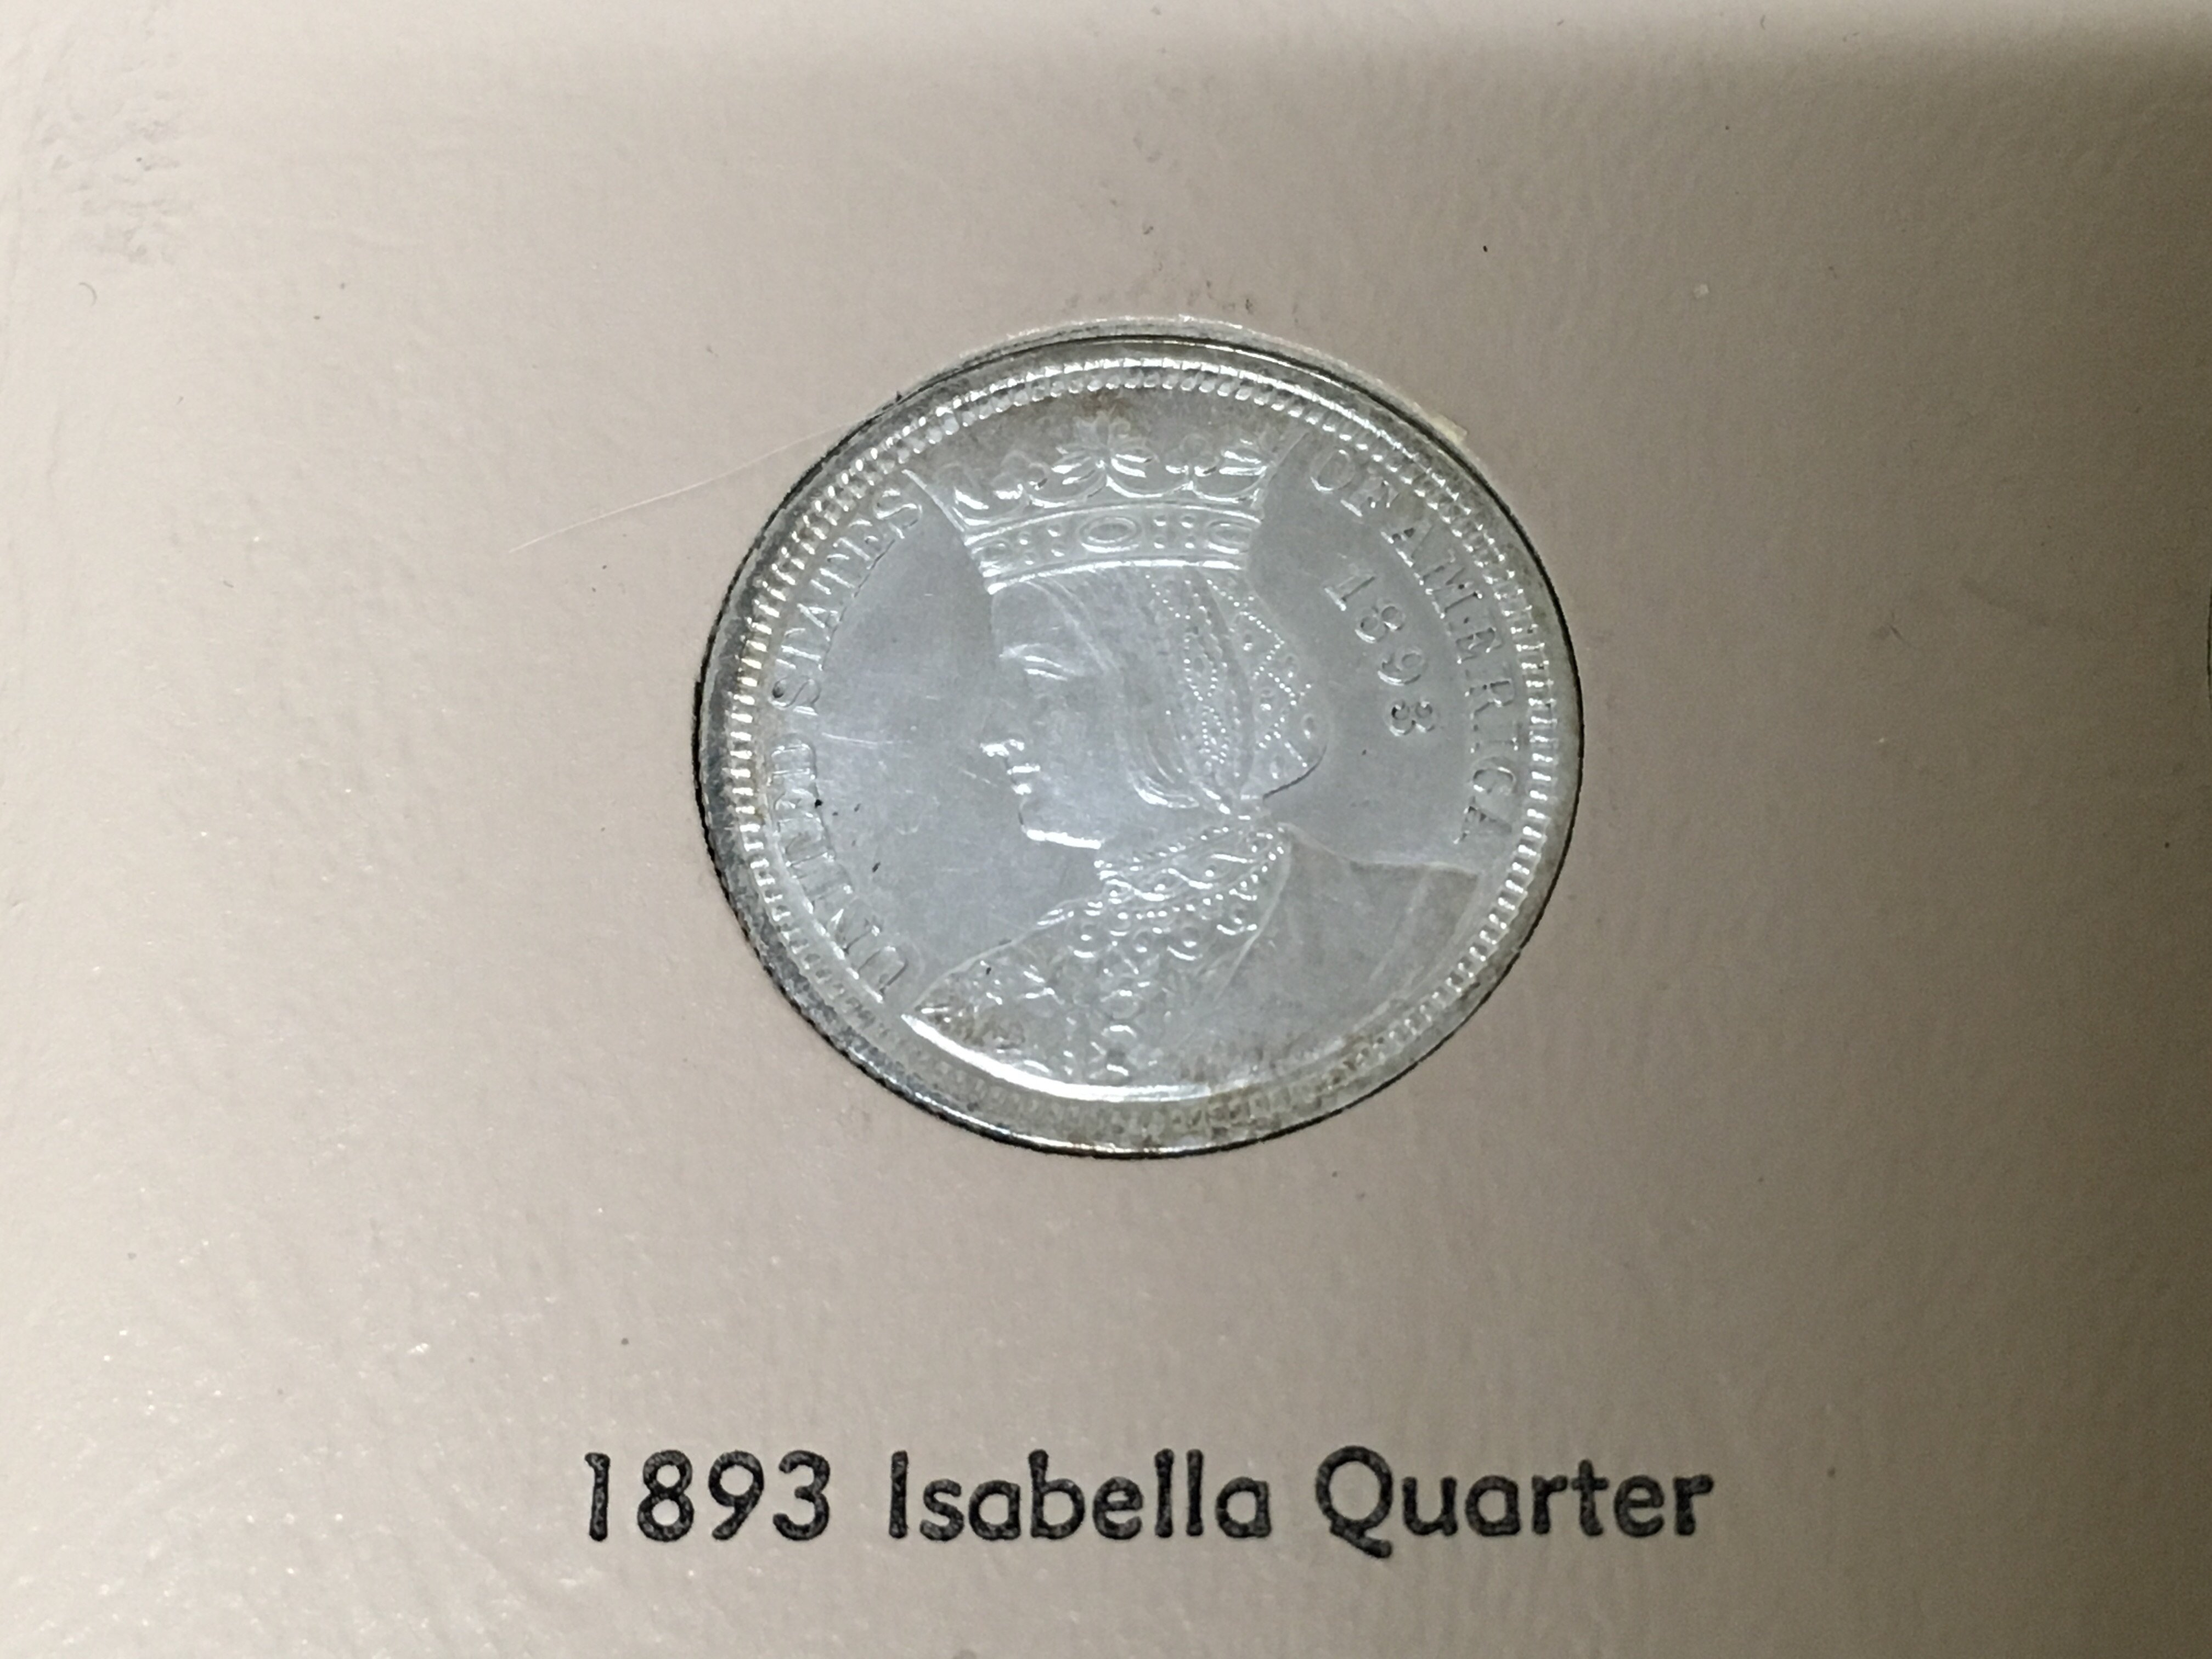 Lot 149 - A rare American Isabella Quarter Dollar coin. Poss